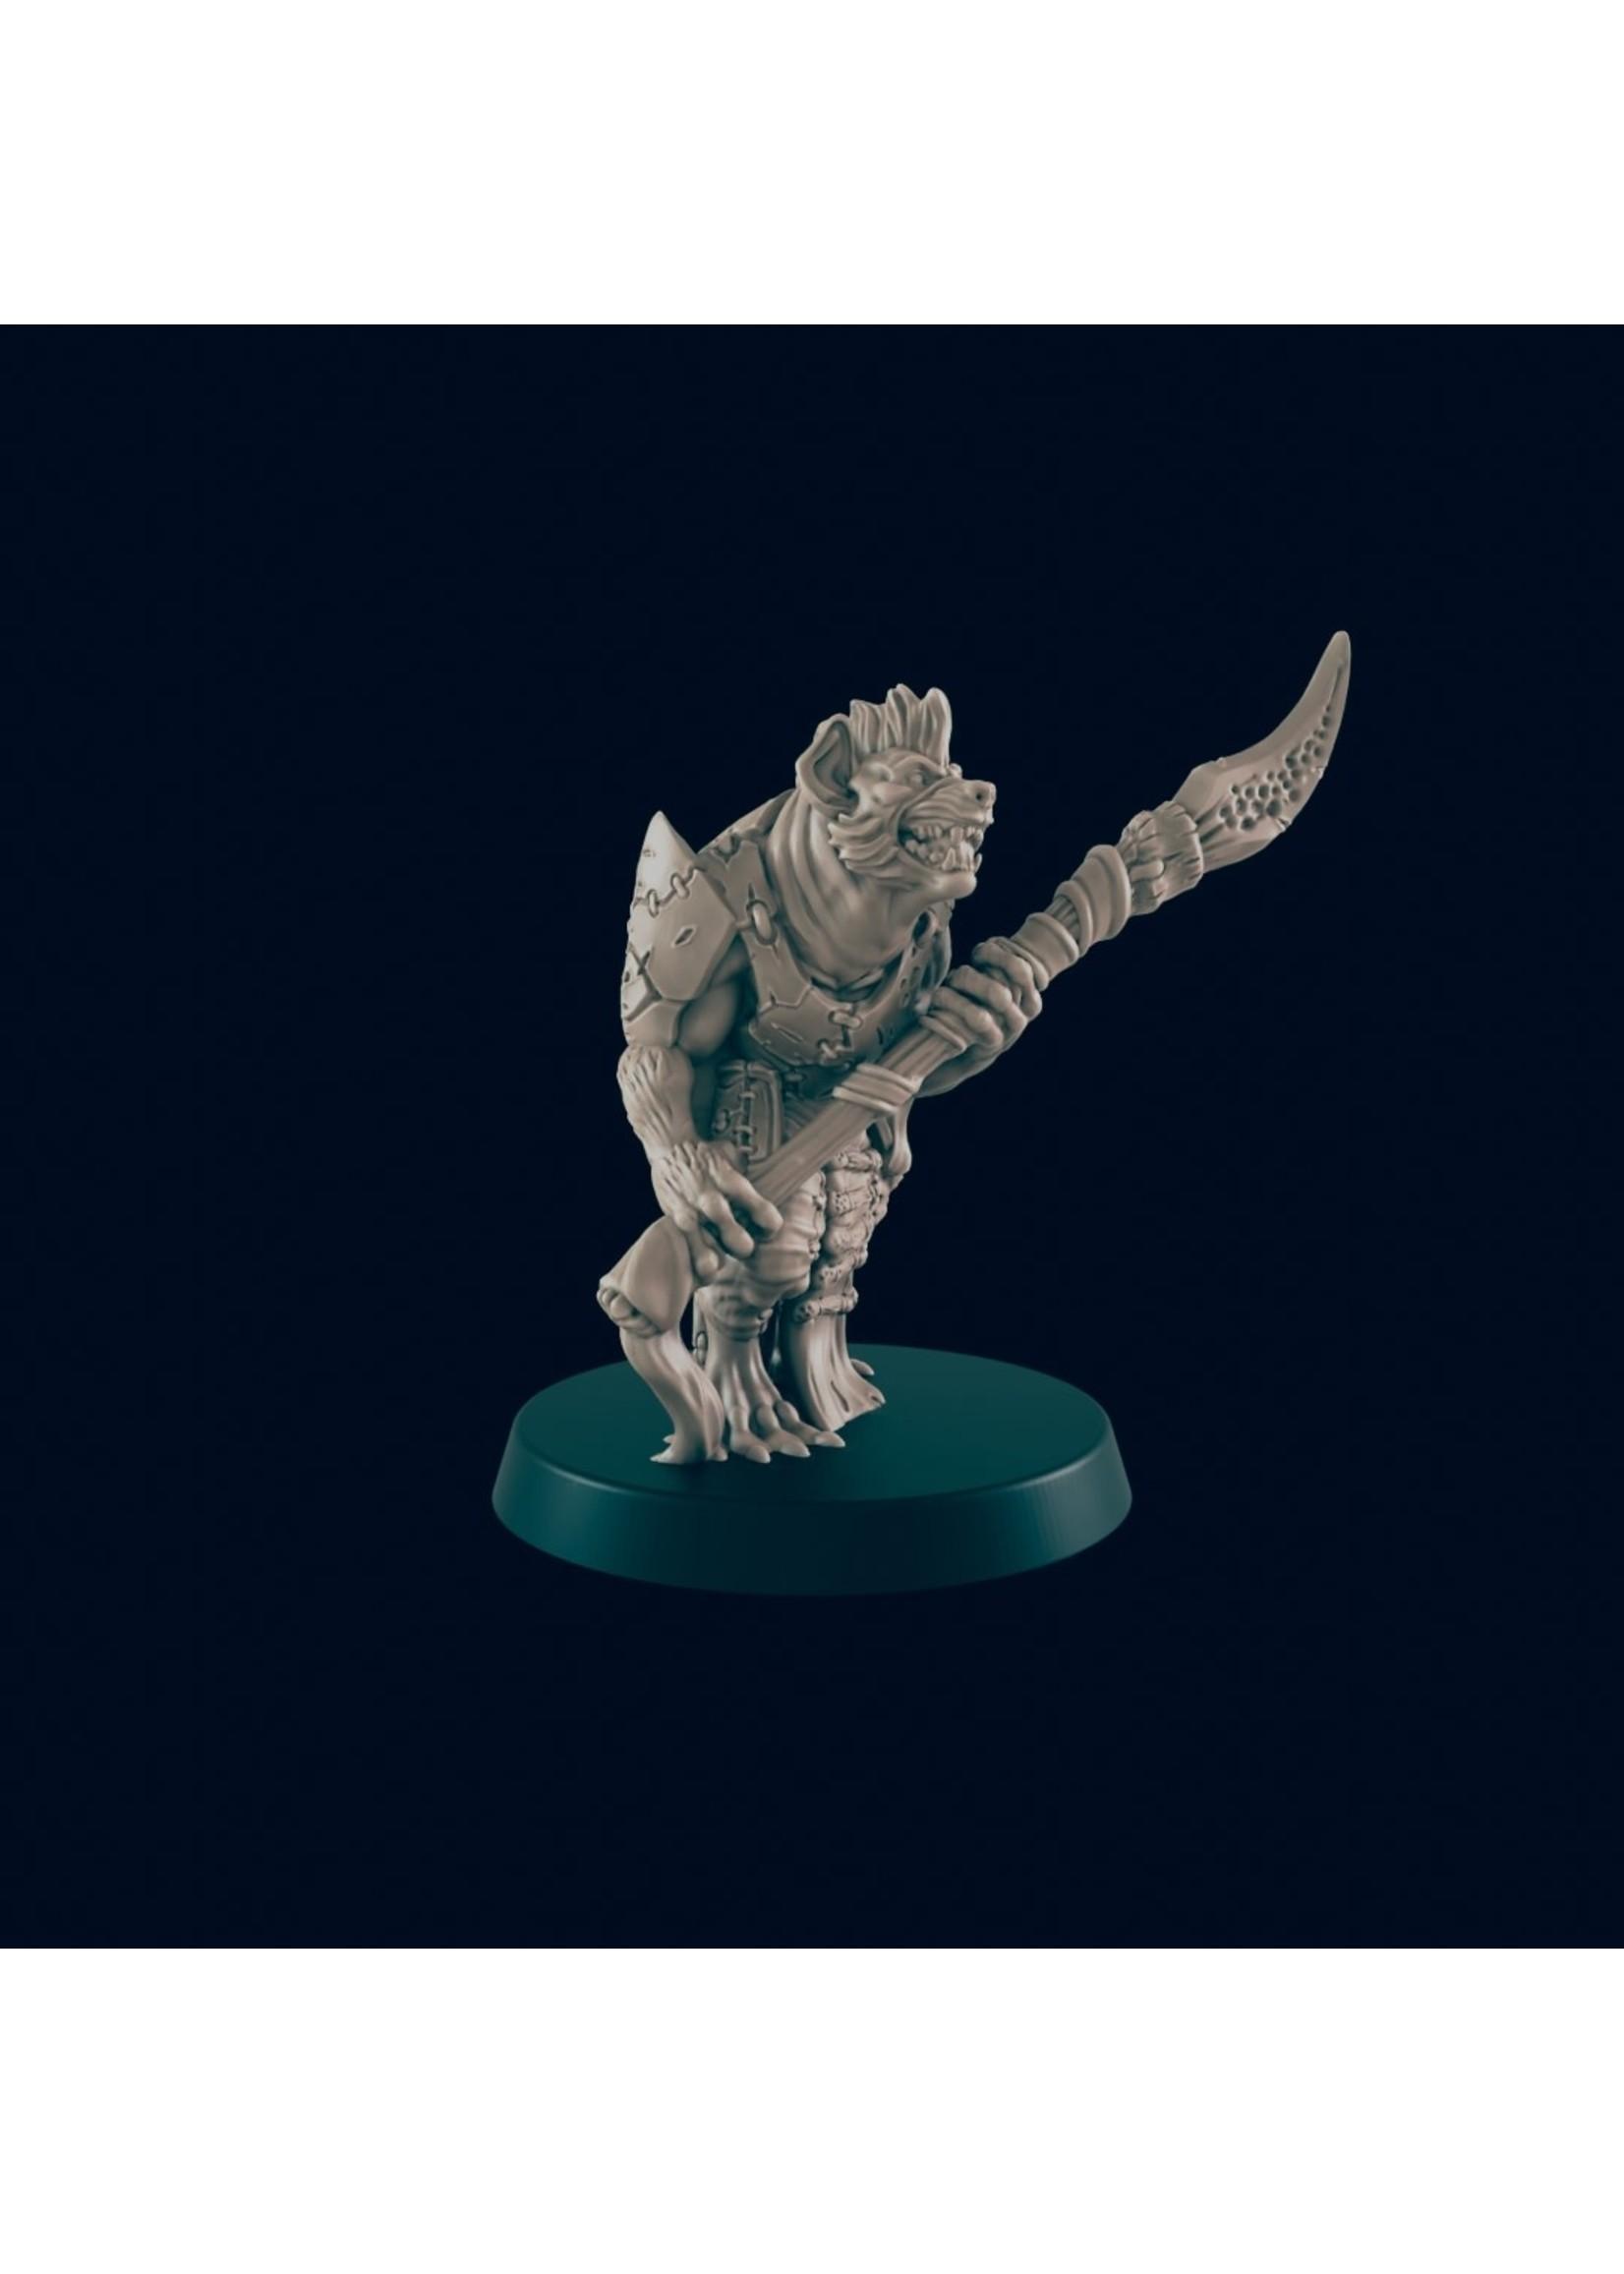 3D Printed Miniature - Gnoll Spearman - Dungeons & Dragons - Beasts and Baddies KS